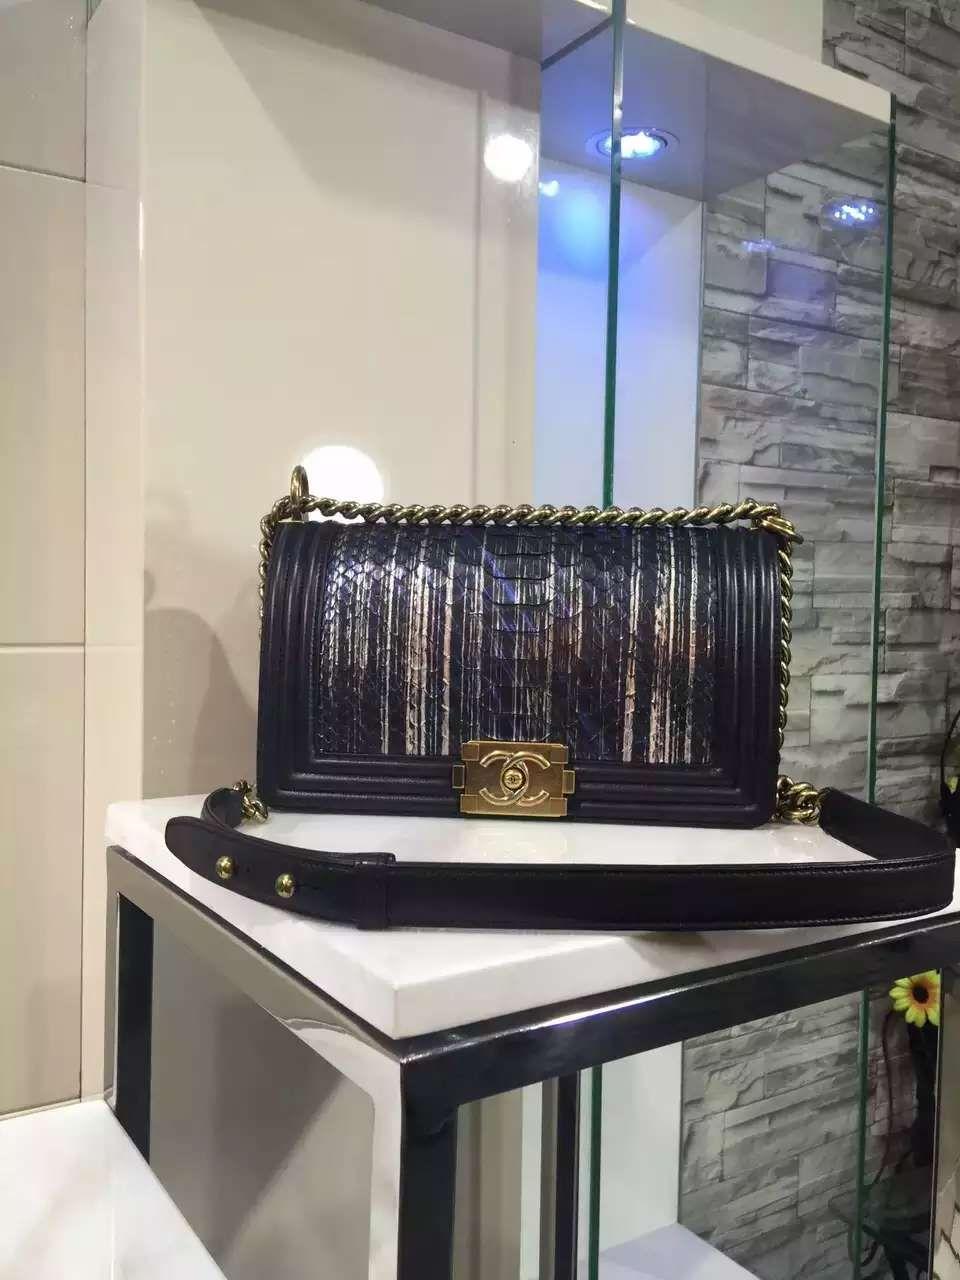 chanel Bag, ID : 63136(FORSALE:a@yybags.com), chanel purse online, chanel designer handbags cheap, buy chanel, chanel latest designer handbags, chanel cheap kids backpacks, e store chanel, chanel online store europe, chanel bags 2016, chanel gift bags for sale, chanel best backpacks, chanel ladies backpacks, chanel fabric totes #chanelBag #chanel #chanel #boho #bags